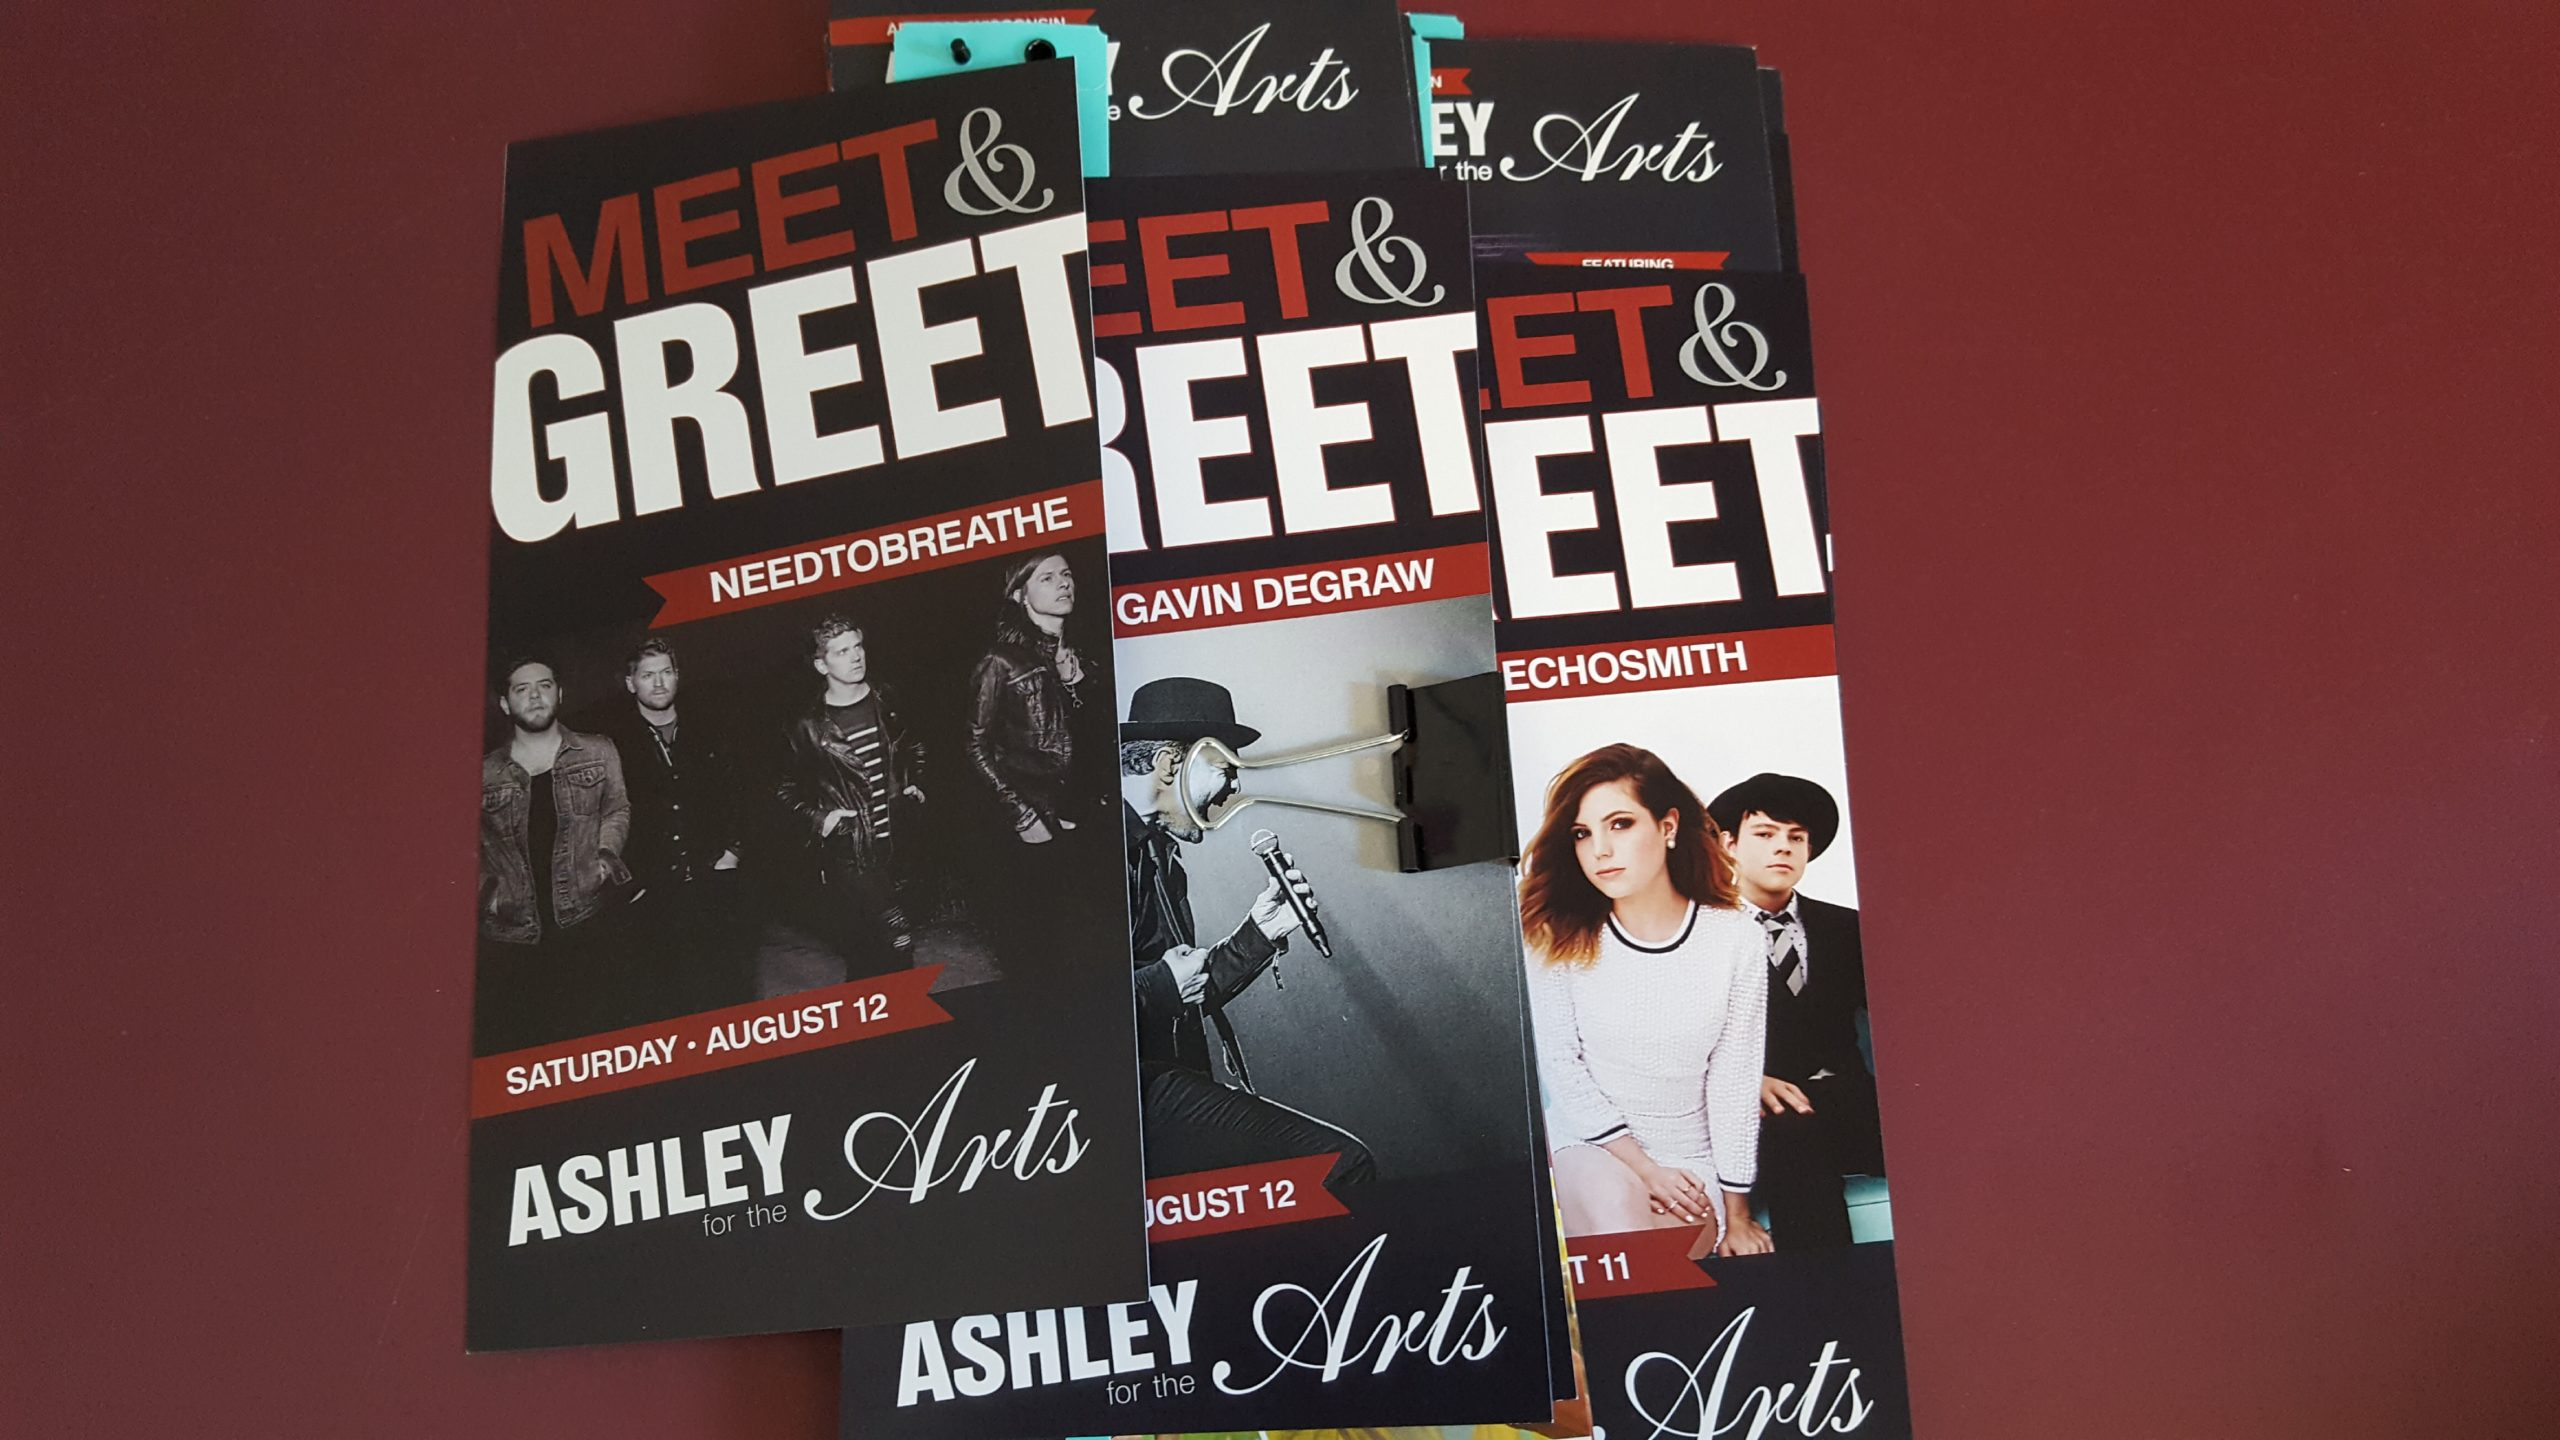 Win Meet & Greets With Echosmith!